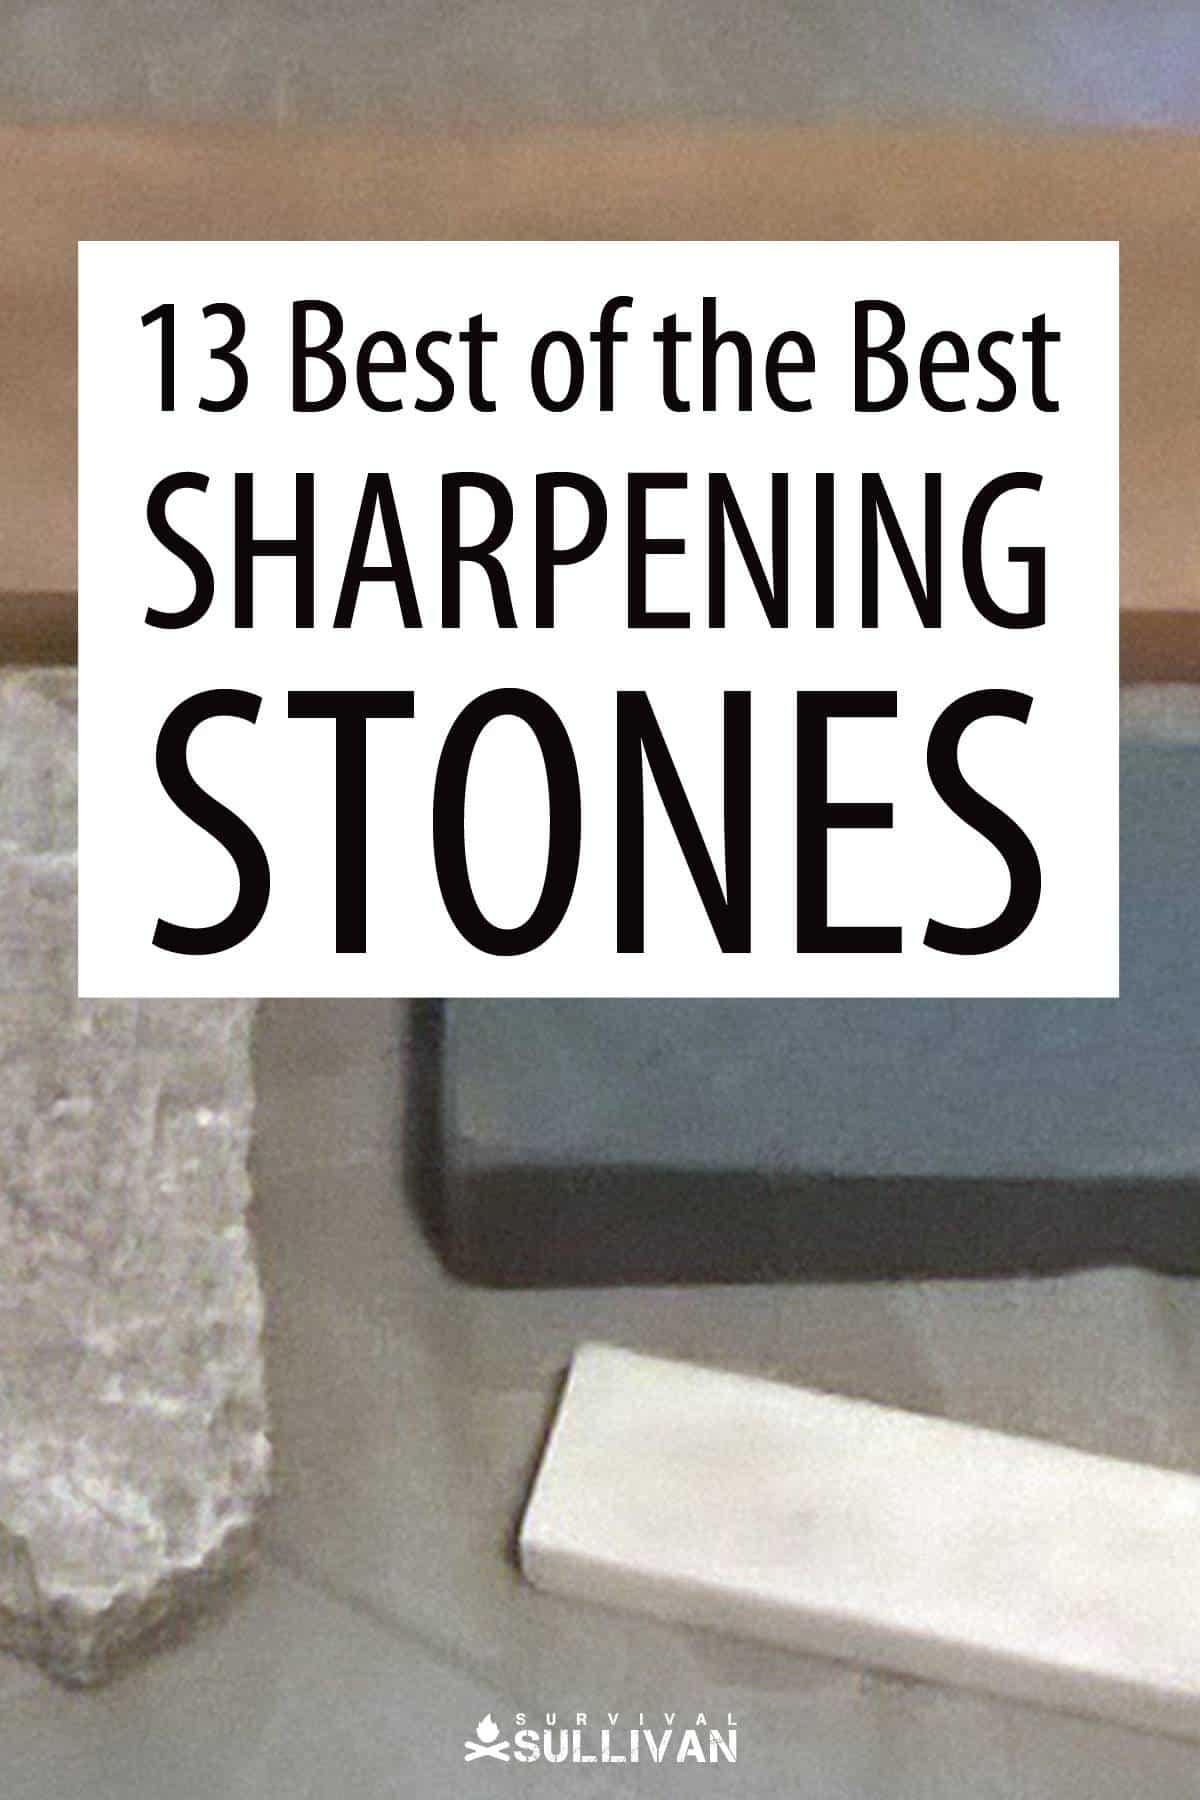 sharpening stones Pinterest image